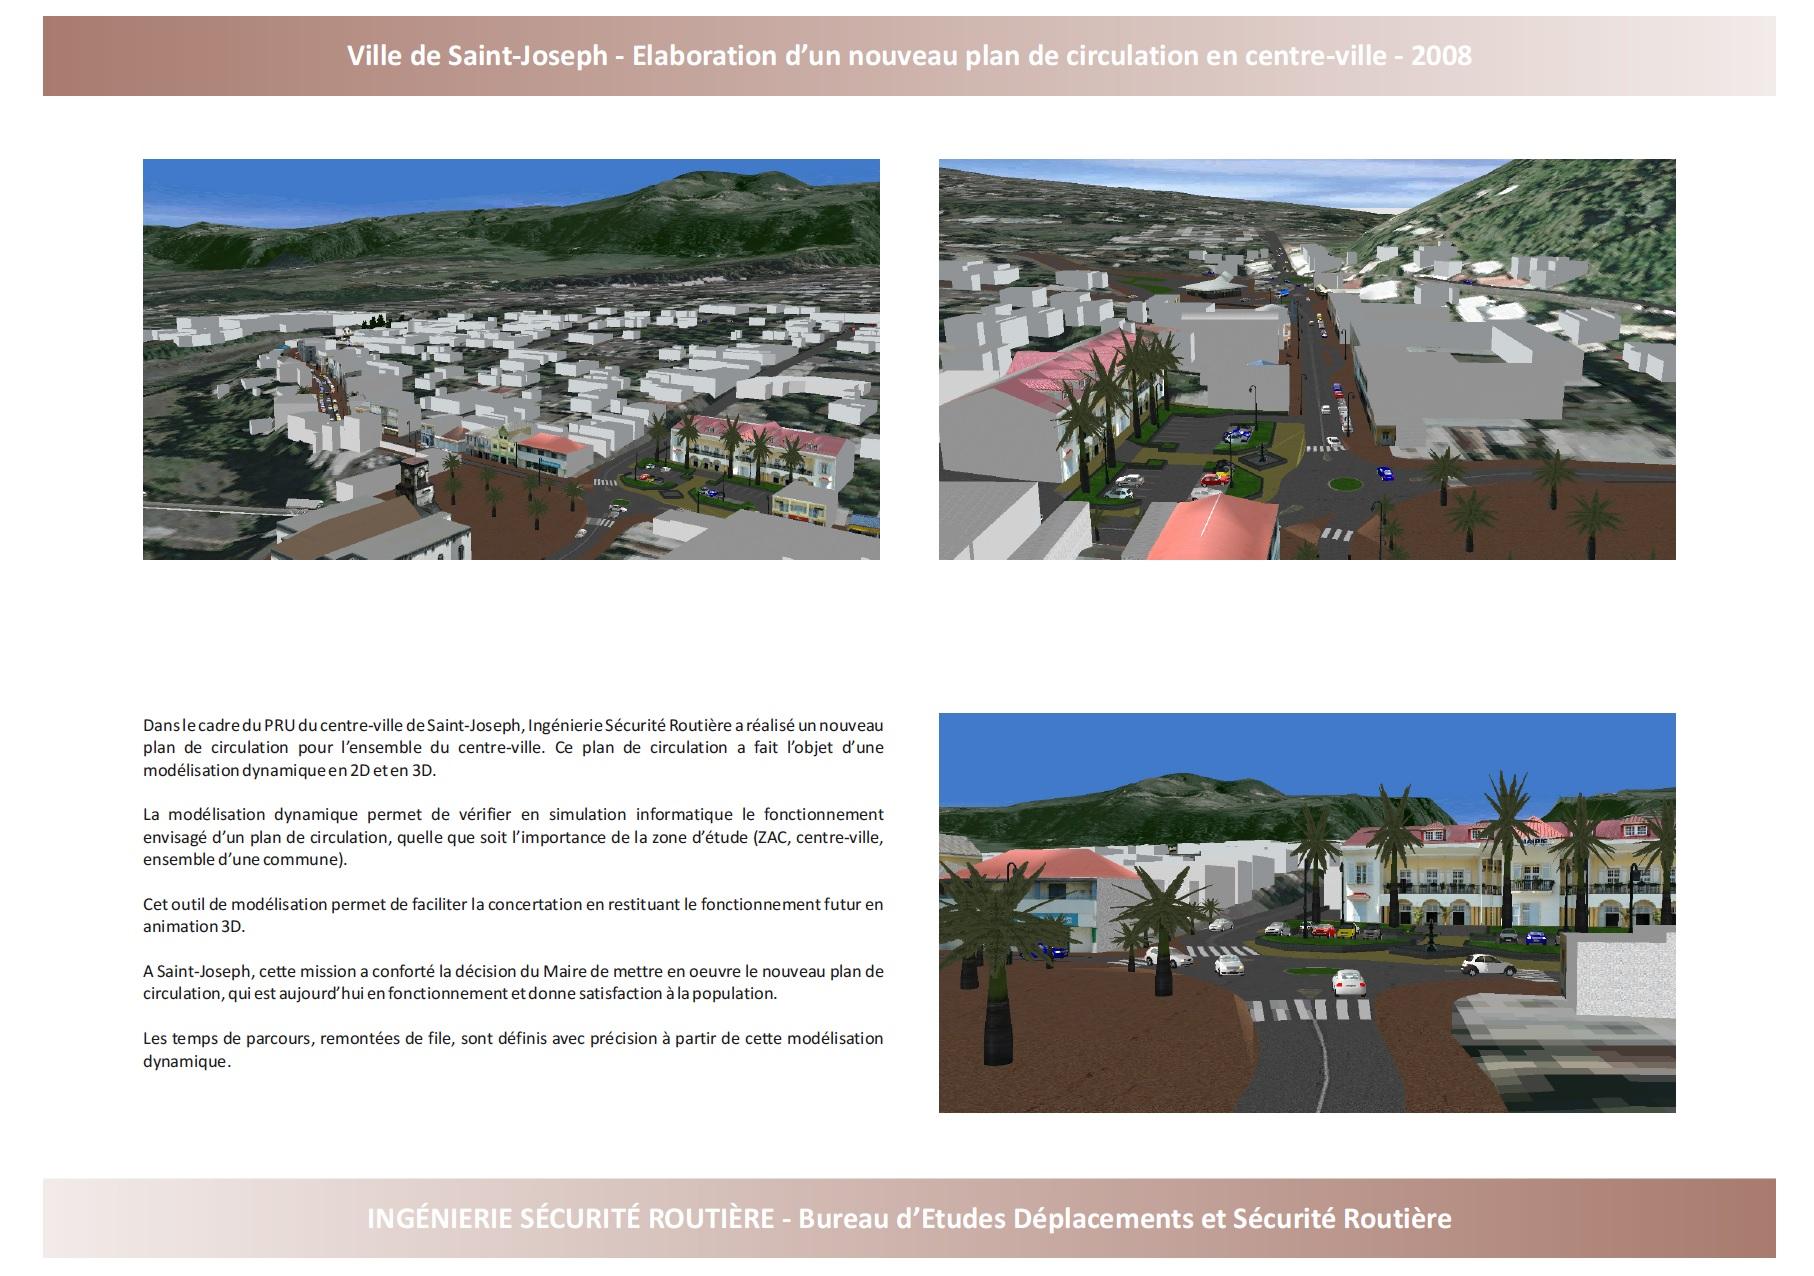 Ville de Saint-Joseph : Plan de circulation